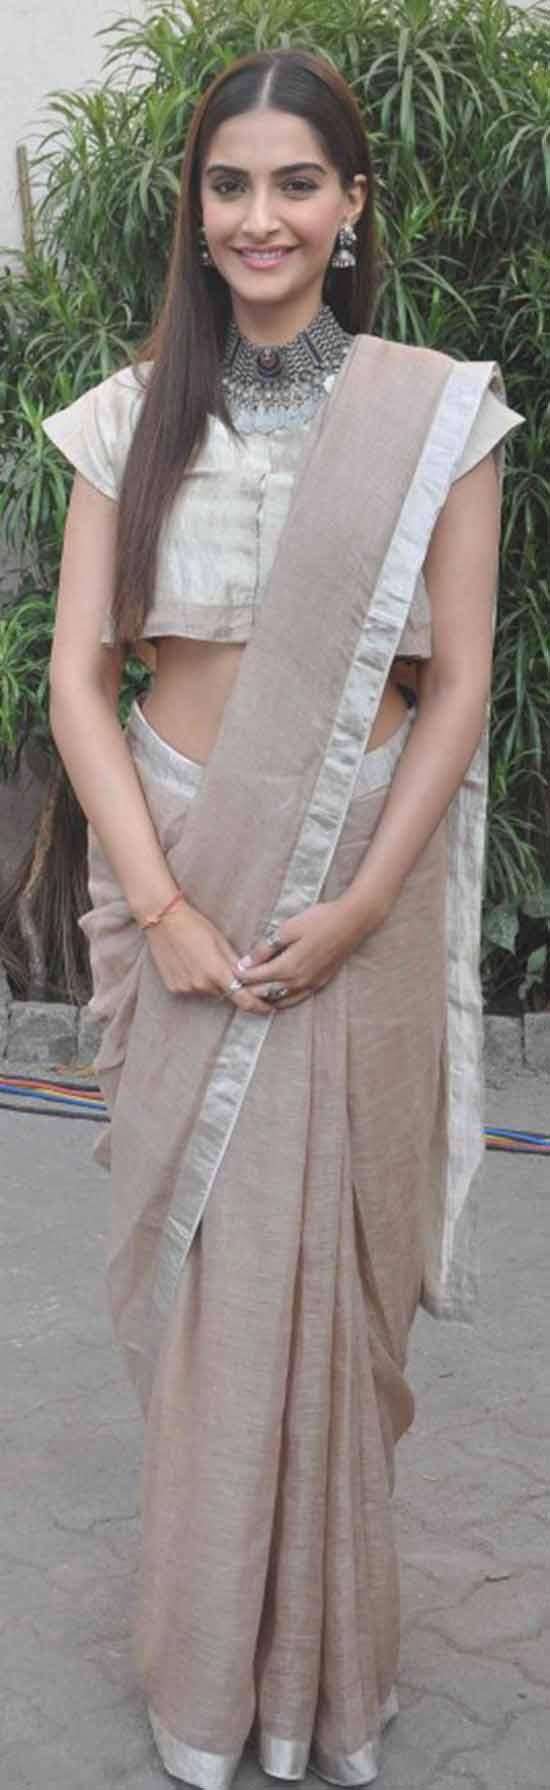 Sonam-Kapoor-in-a-beige-colored-Anavila-Saree